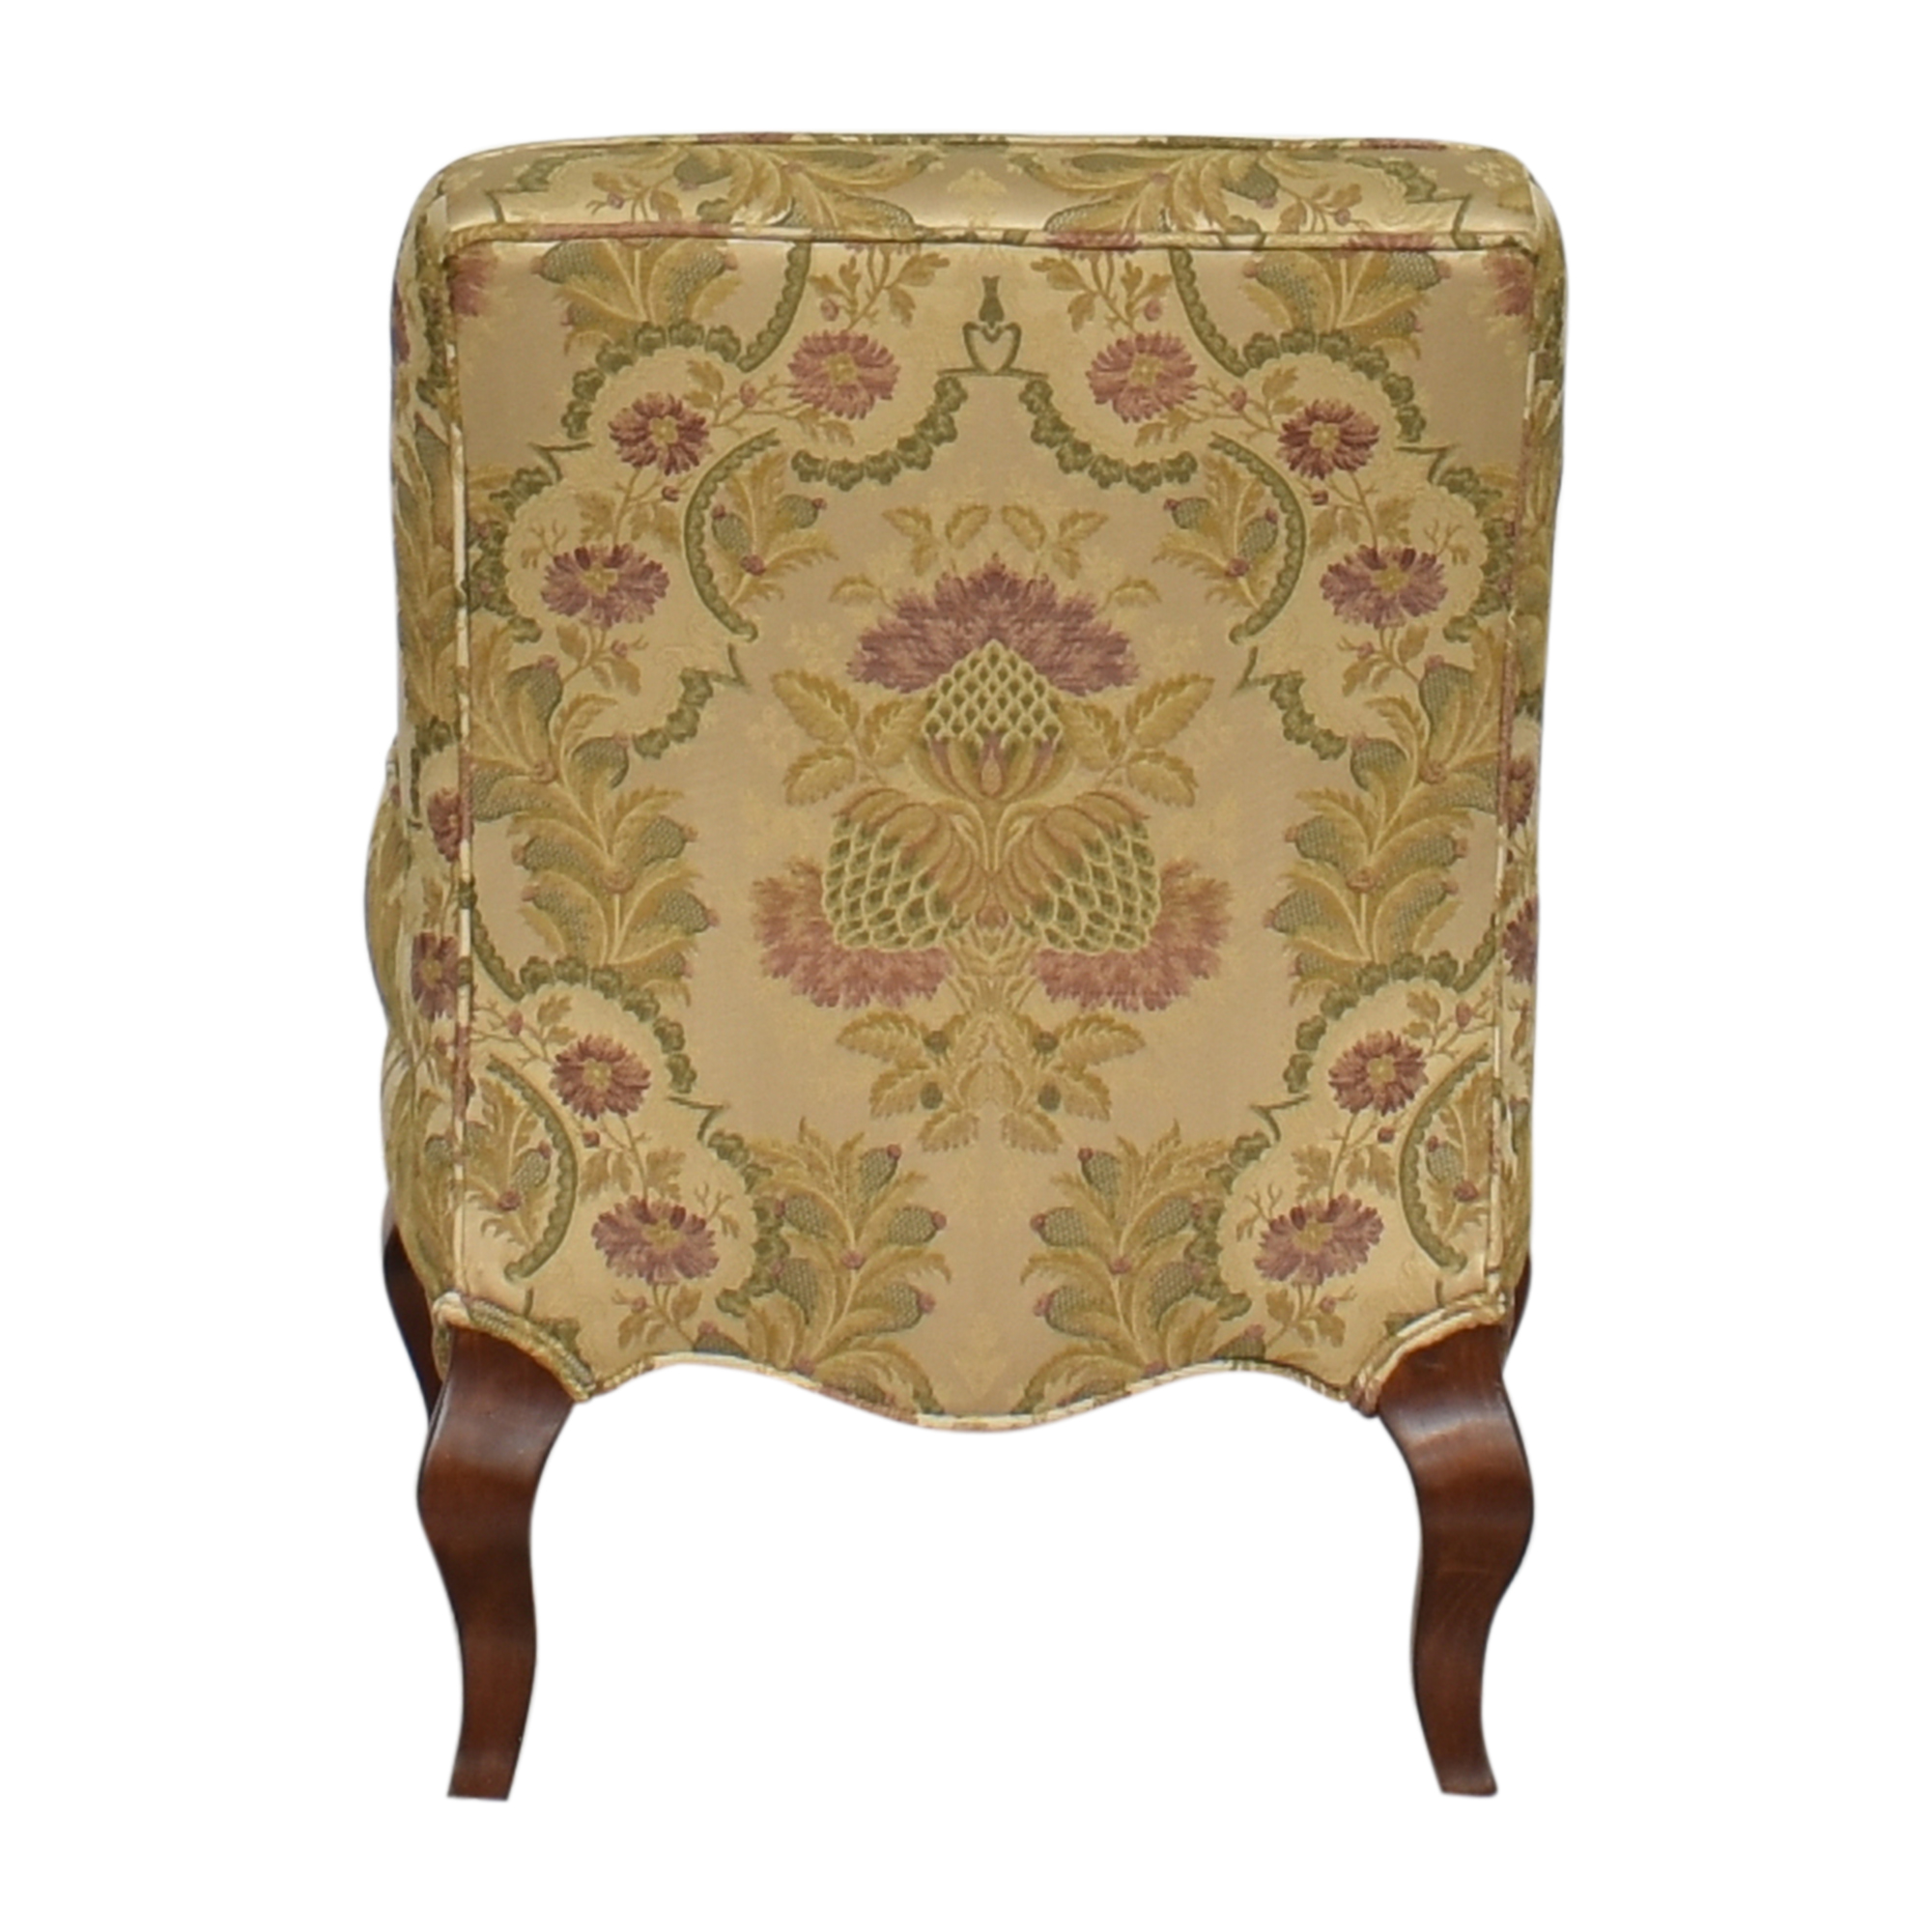 buy Domain Home Slipper Chair Domain Home Chairs